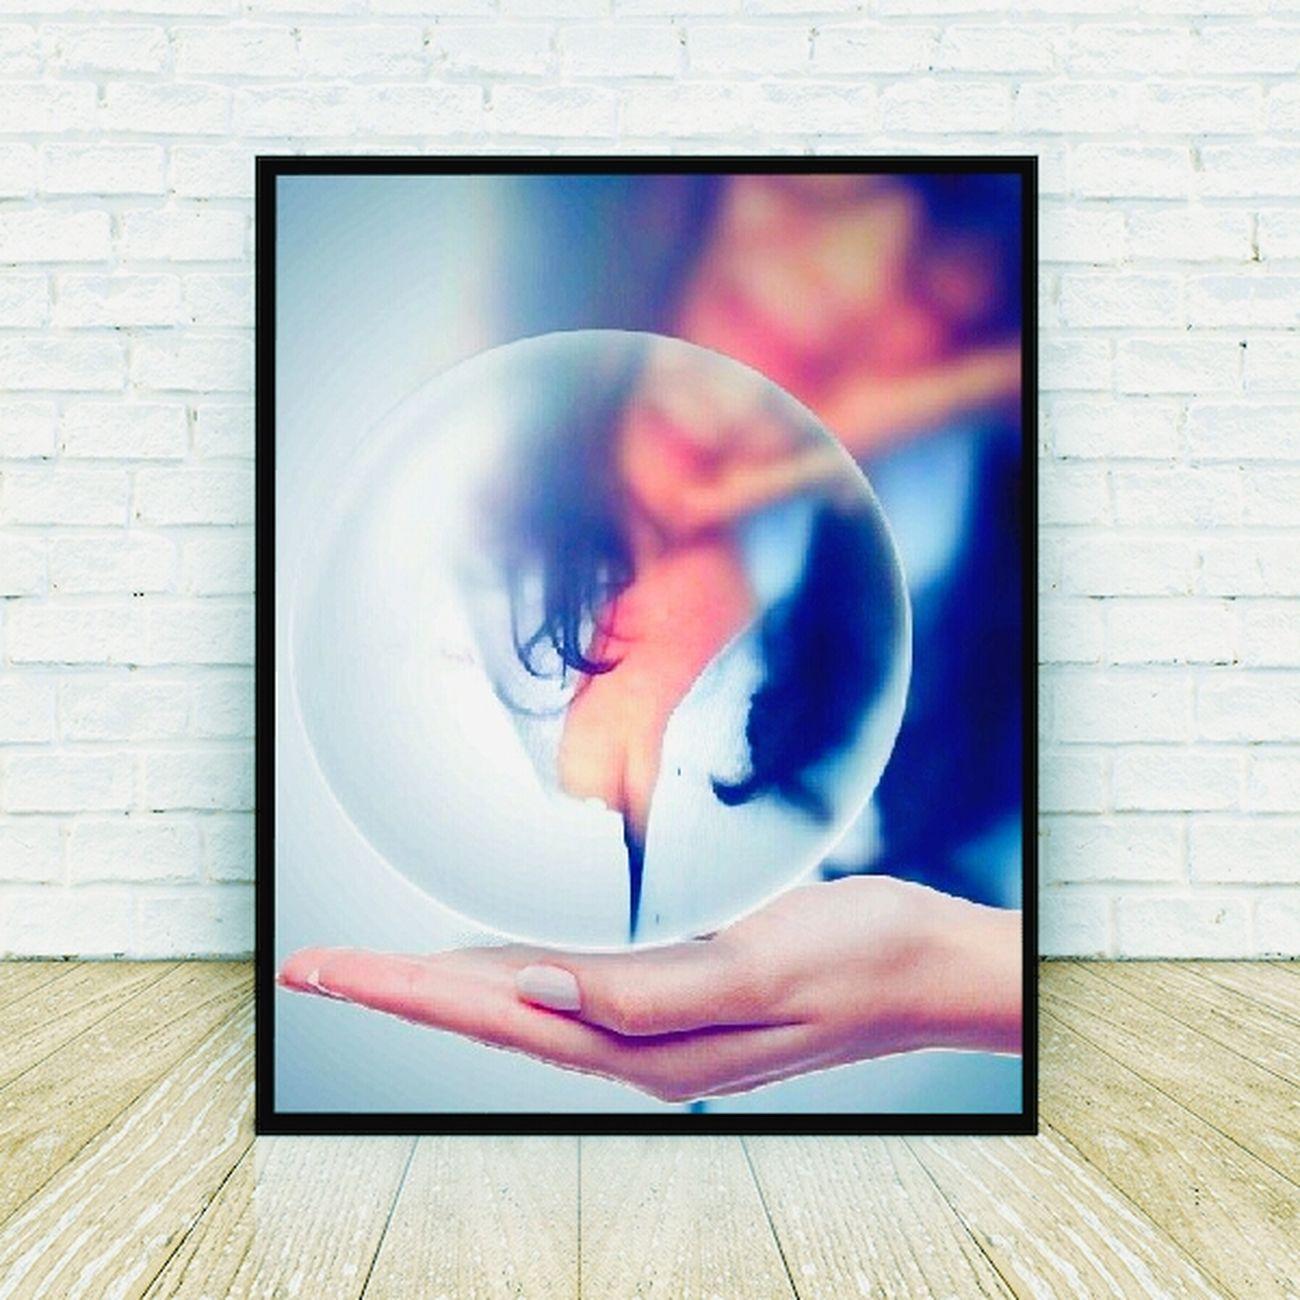 Females ArtWork Portrait Of A Woman Selfie ✌ Woman Of EyeEm Art, Drawing, Creativity Women Lifestyles Beautiful Woman Sensual_woman Femmefatale Human Hand Human Body Part